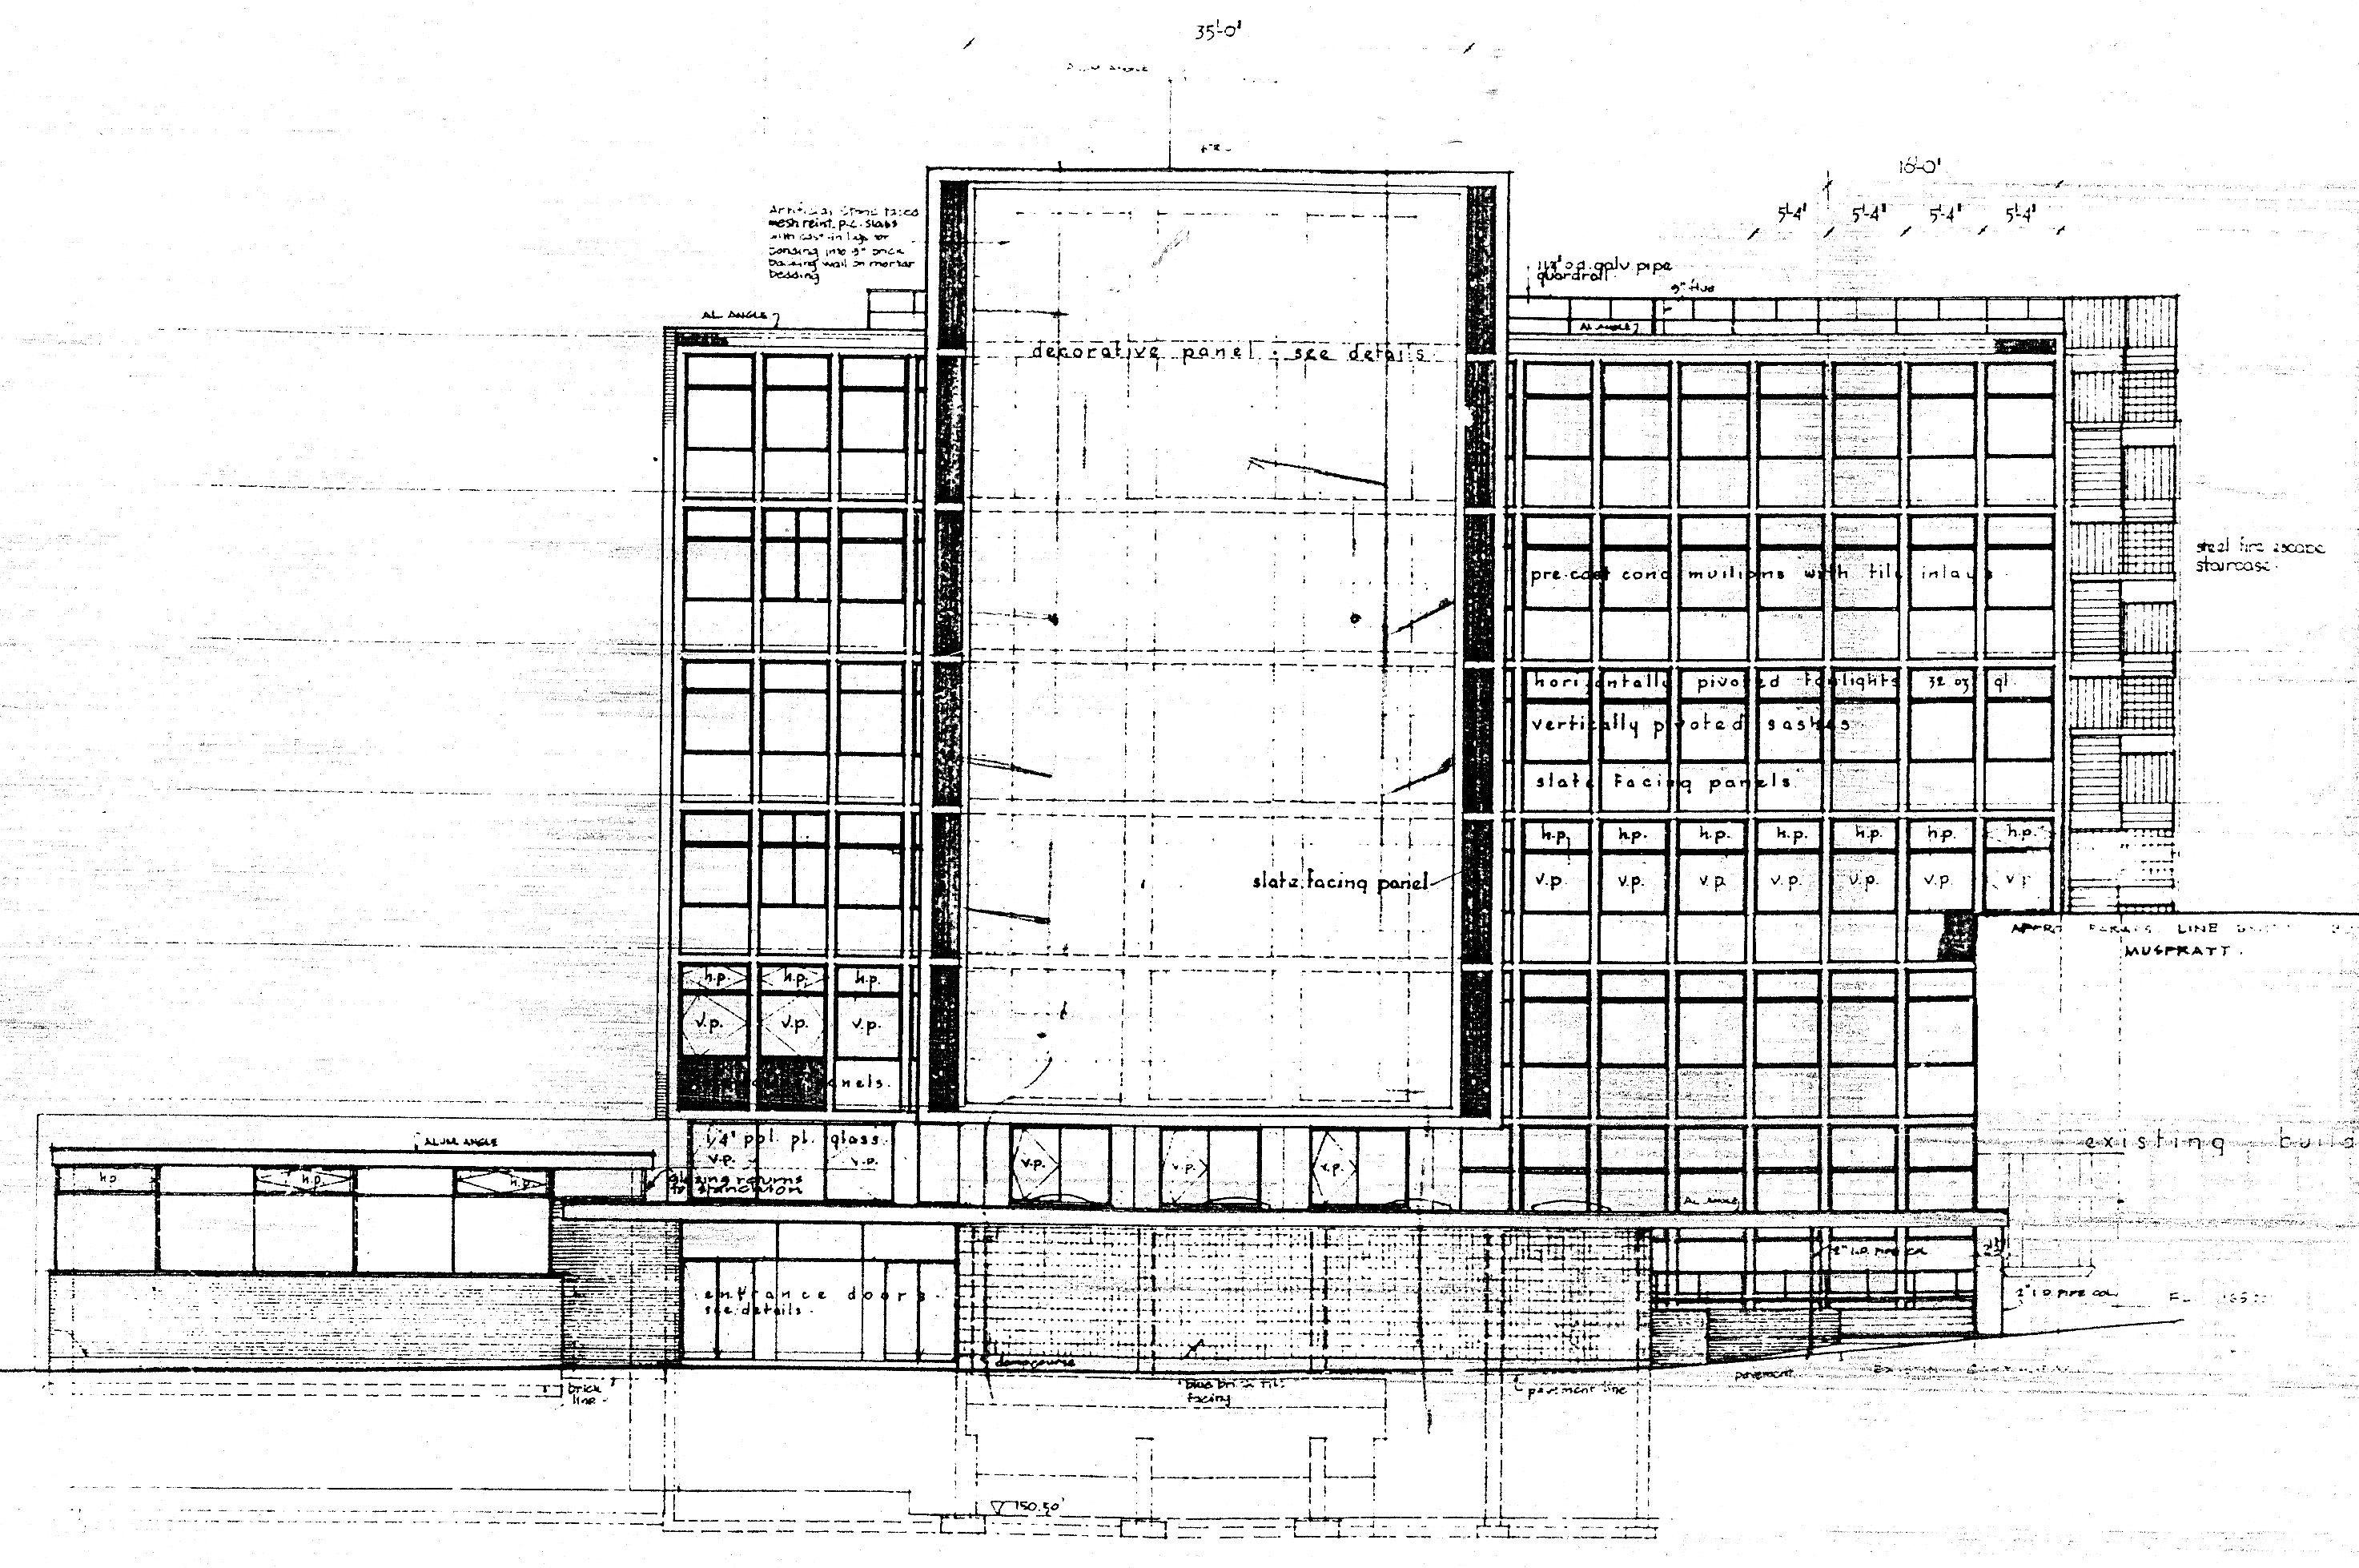 Civil Engineering Building University Of Liverpool